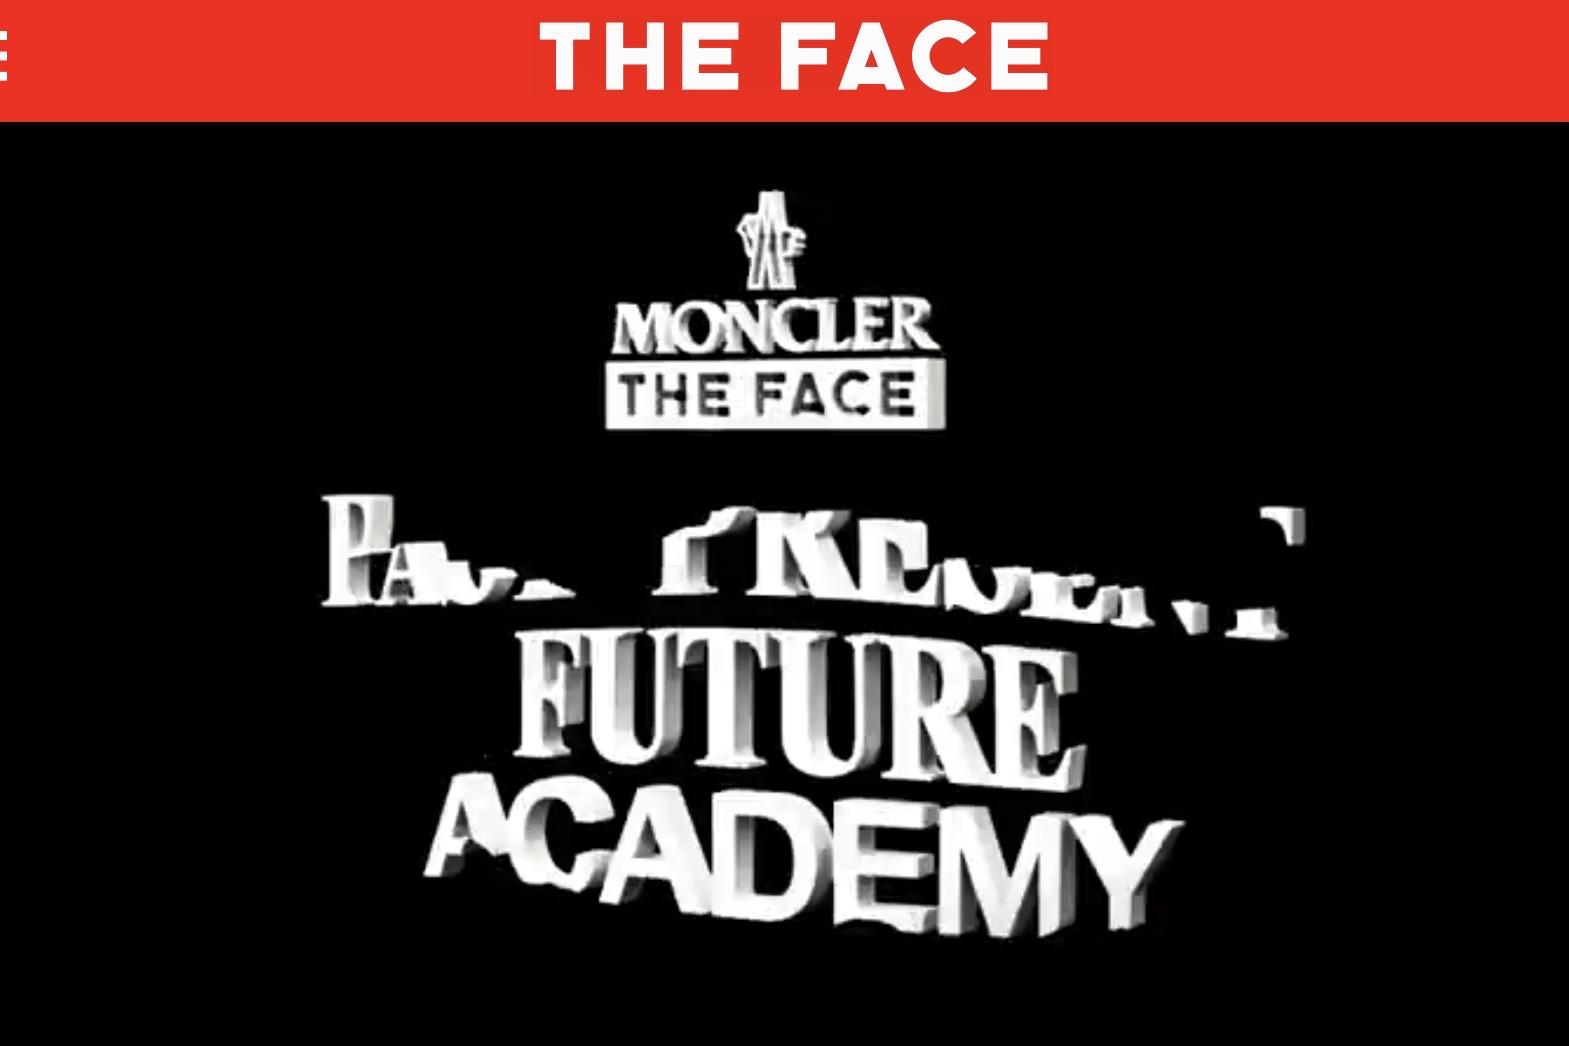 Moncler 联合英国杂志《THE FACE》推出创意人才培养项目Future Academy